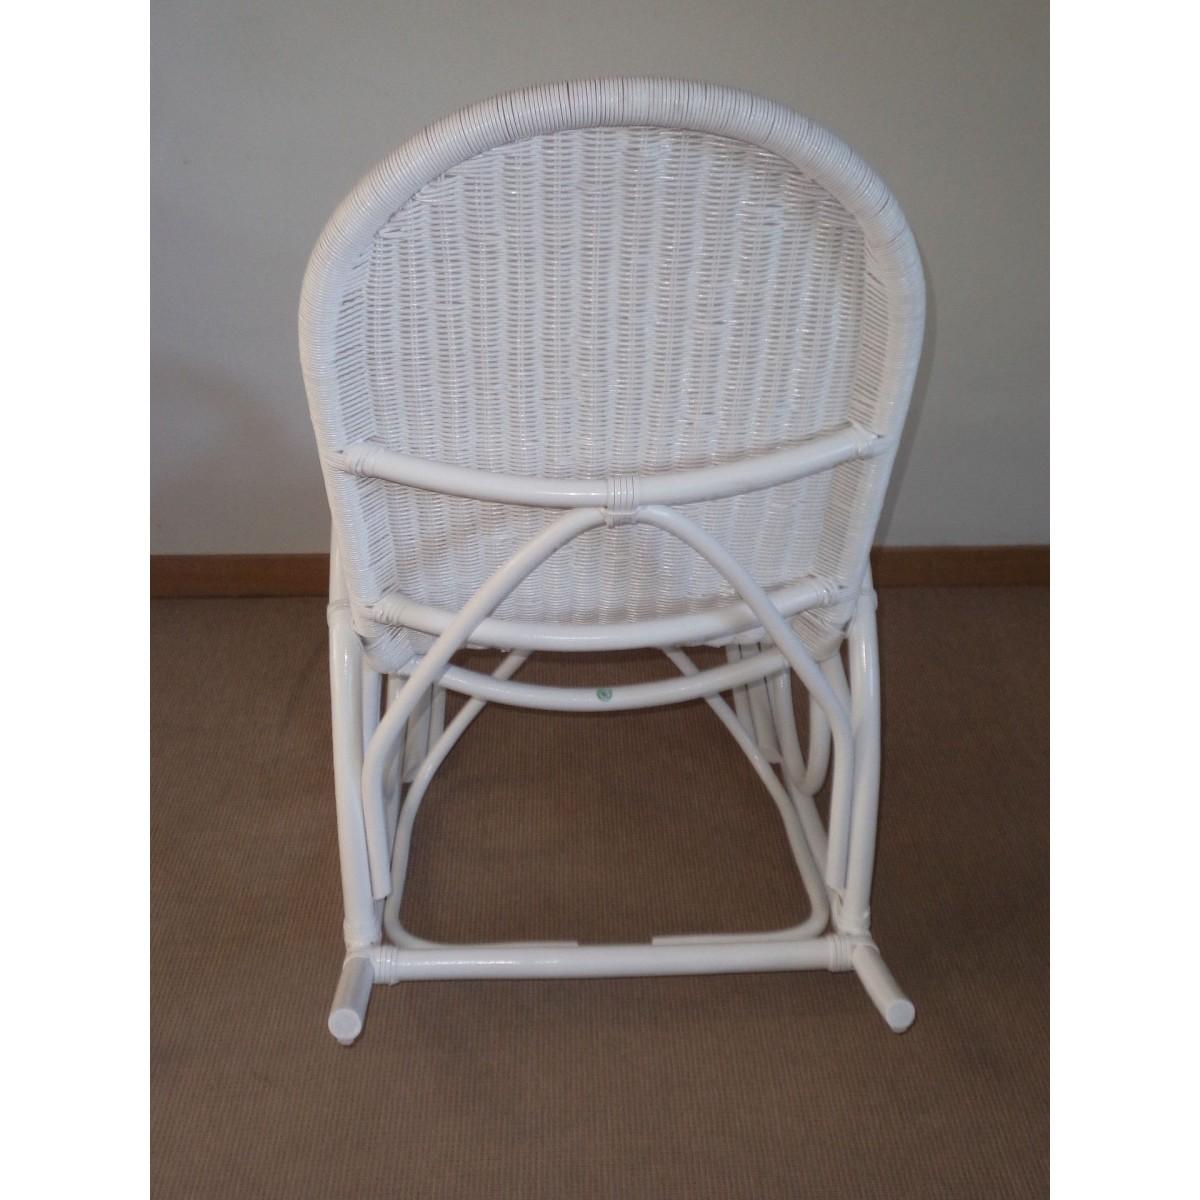 Rocking chair en rotin coloris blanc laqu - Rocking chair blanc conforama ...